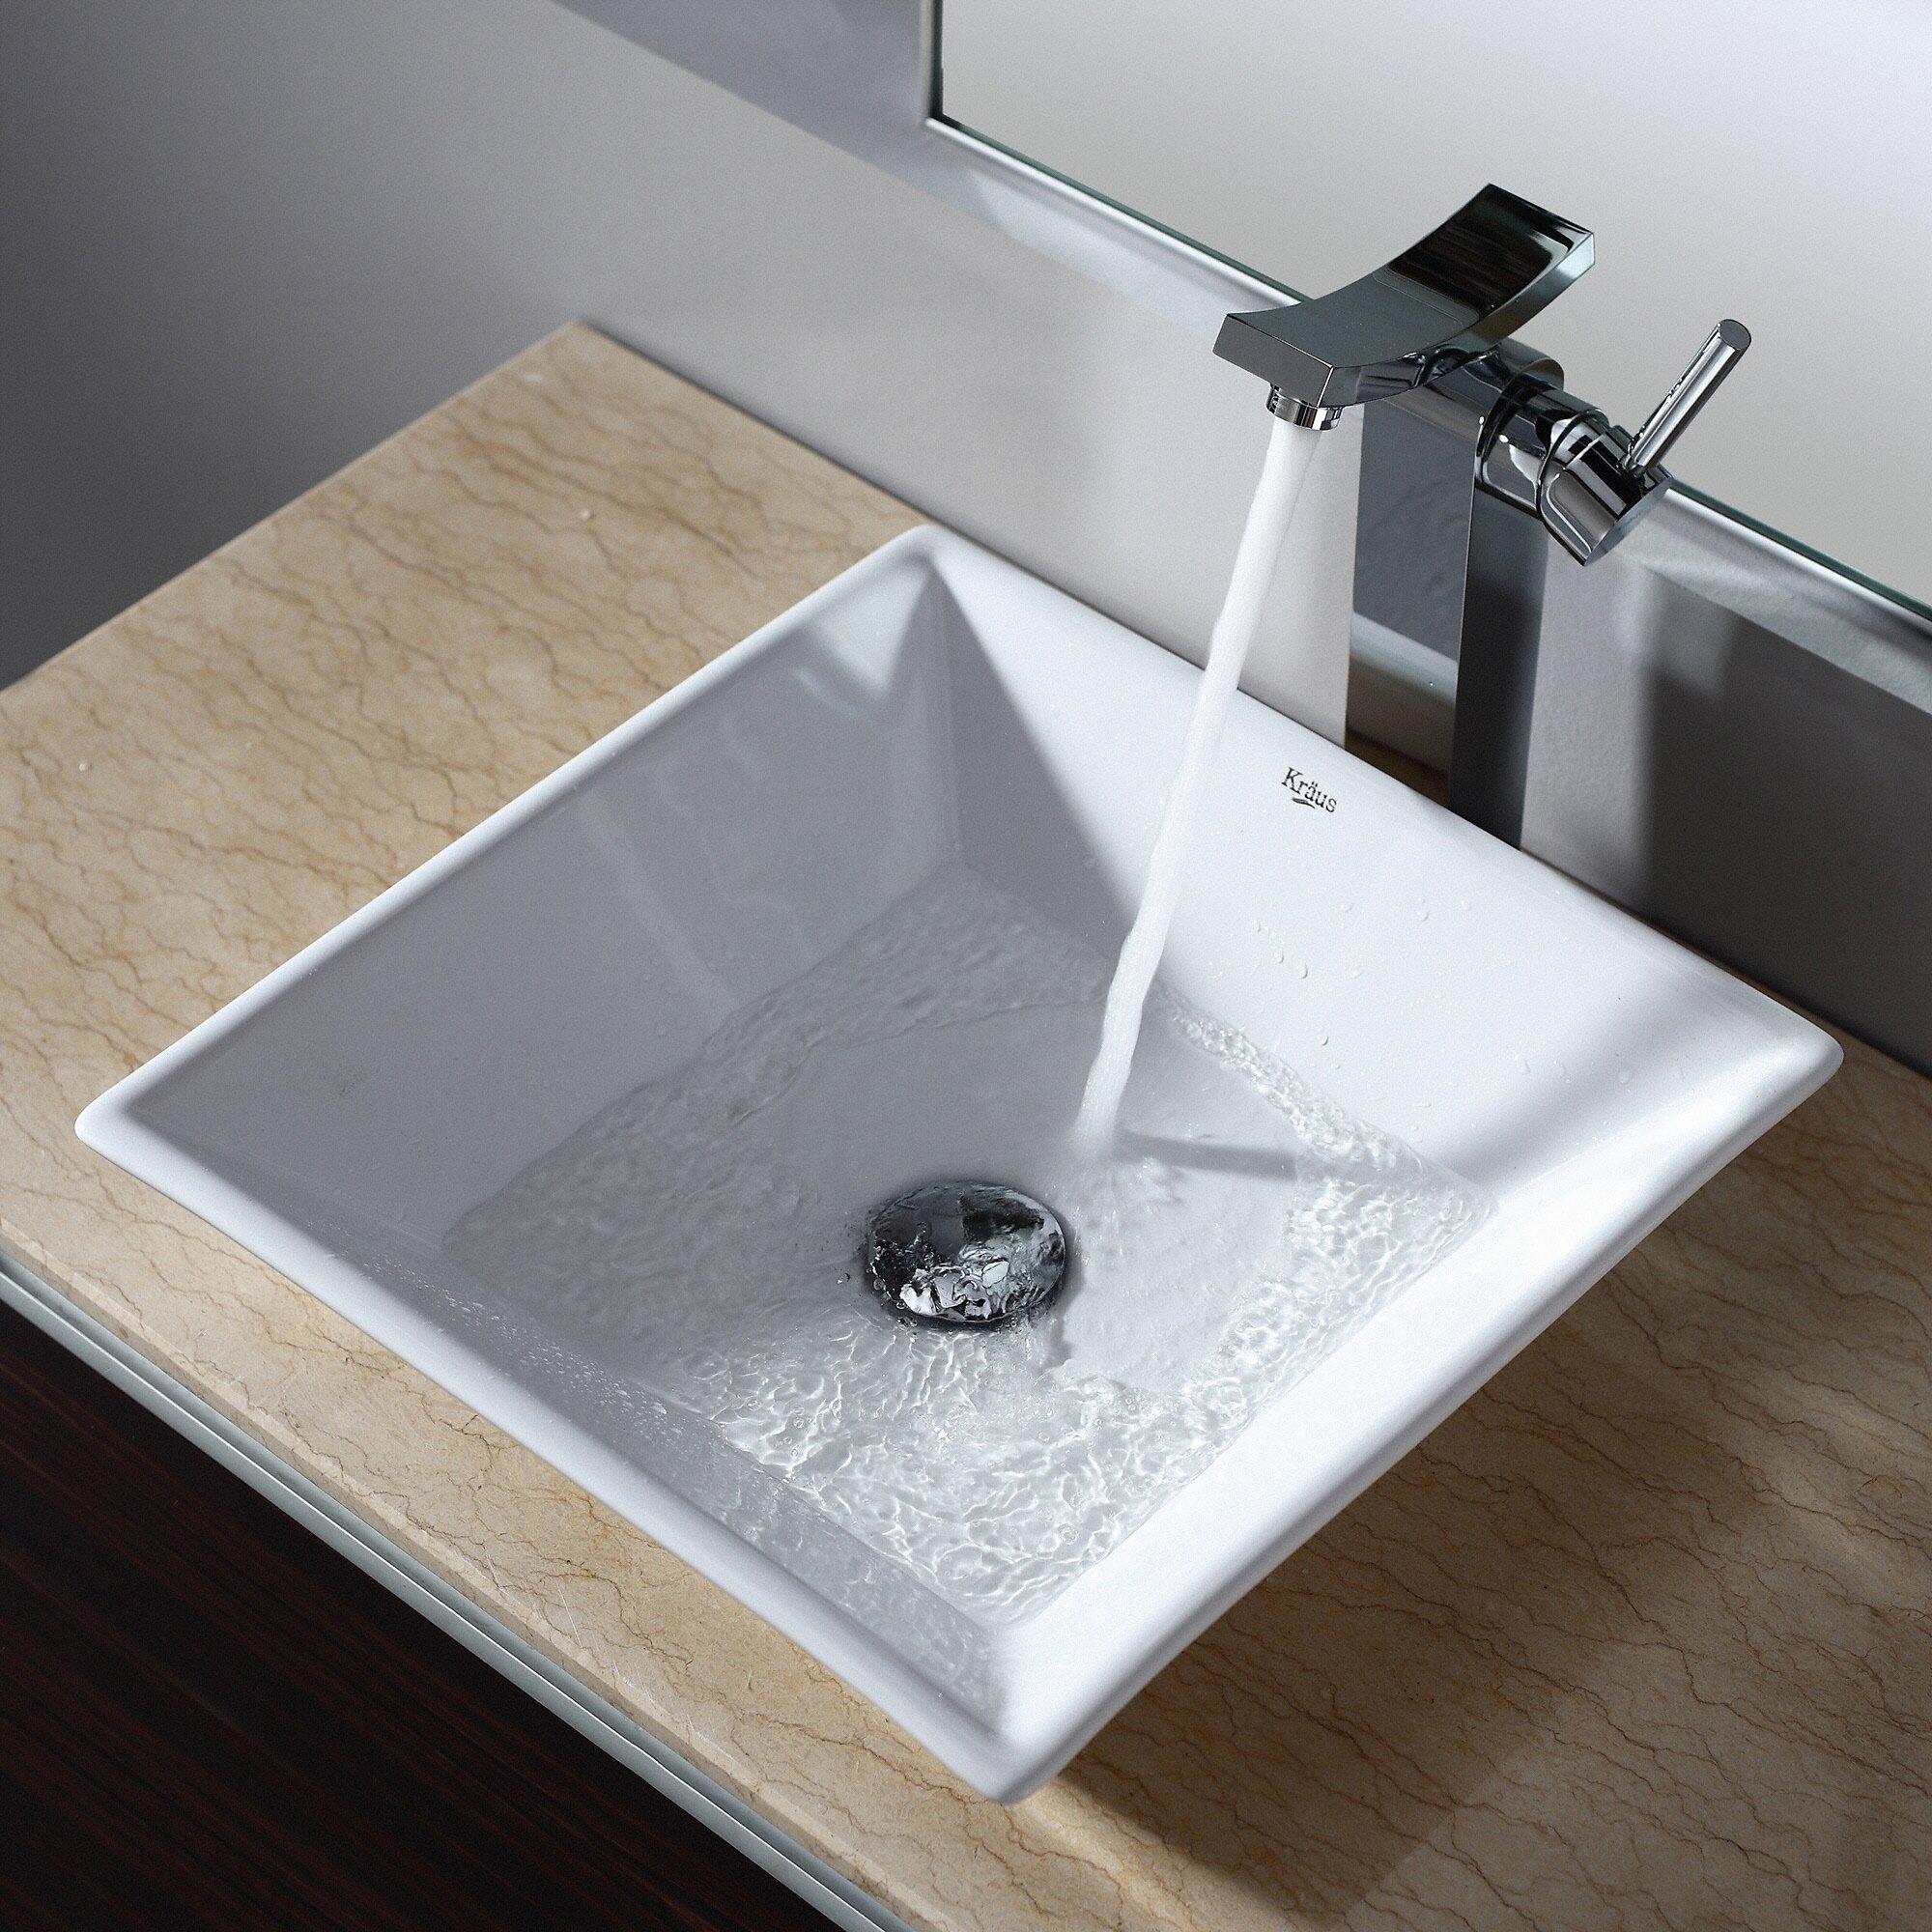 Bathroom square vessel sinks - Ceramic Square Vessel Bathroom Sink